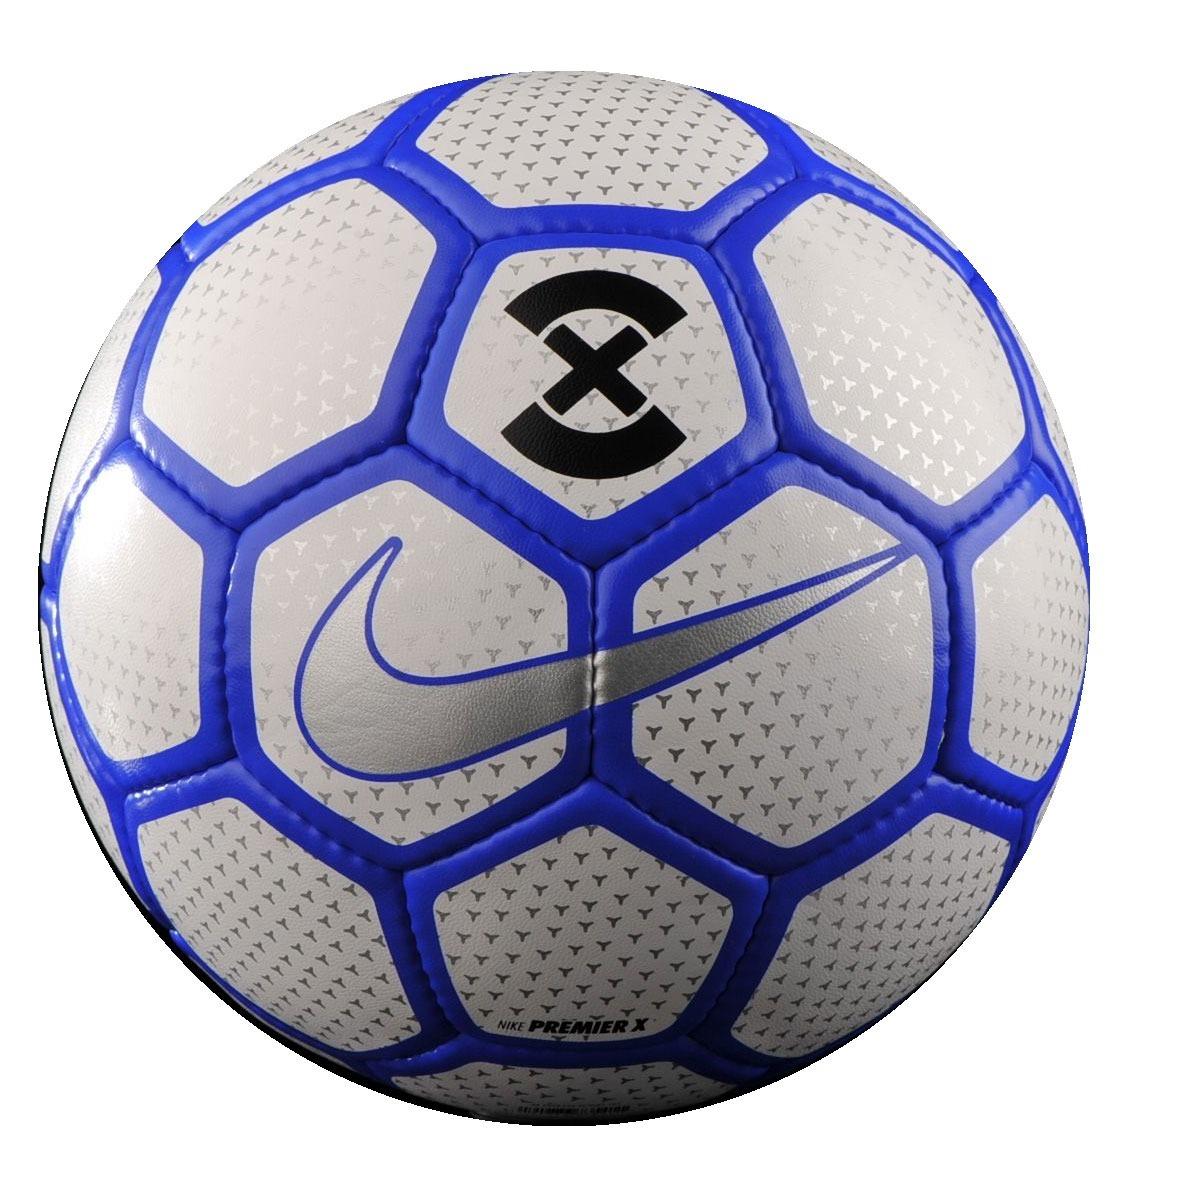 648fb030b6537 bola nike premier football x futsal - original. Carregando zoom.